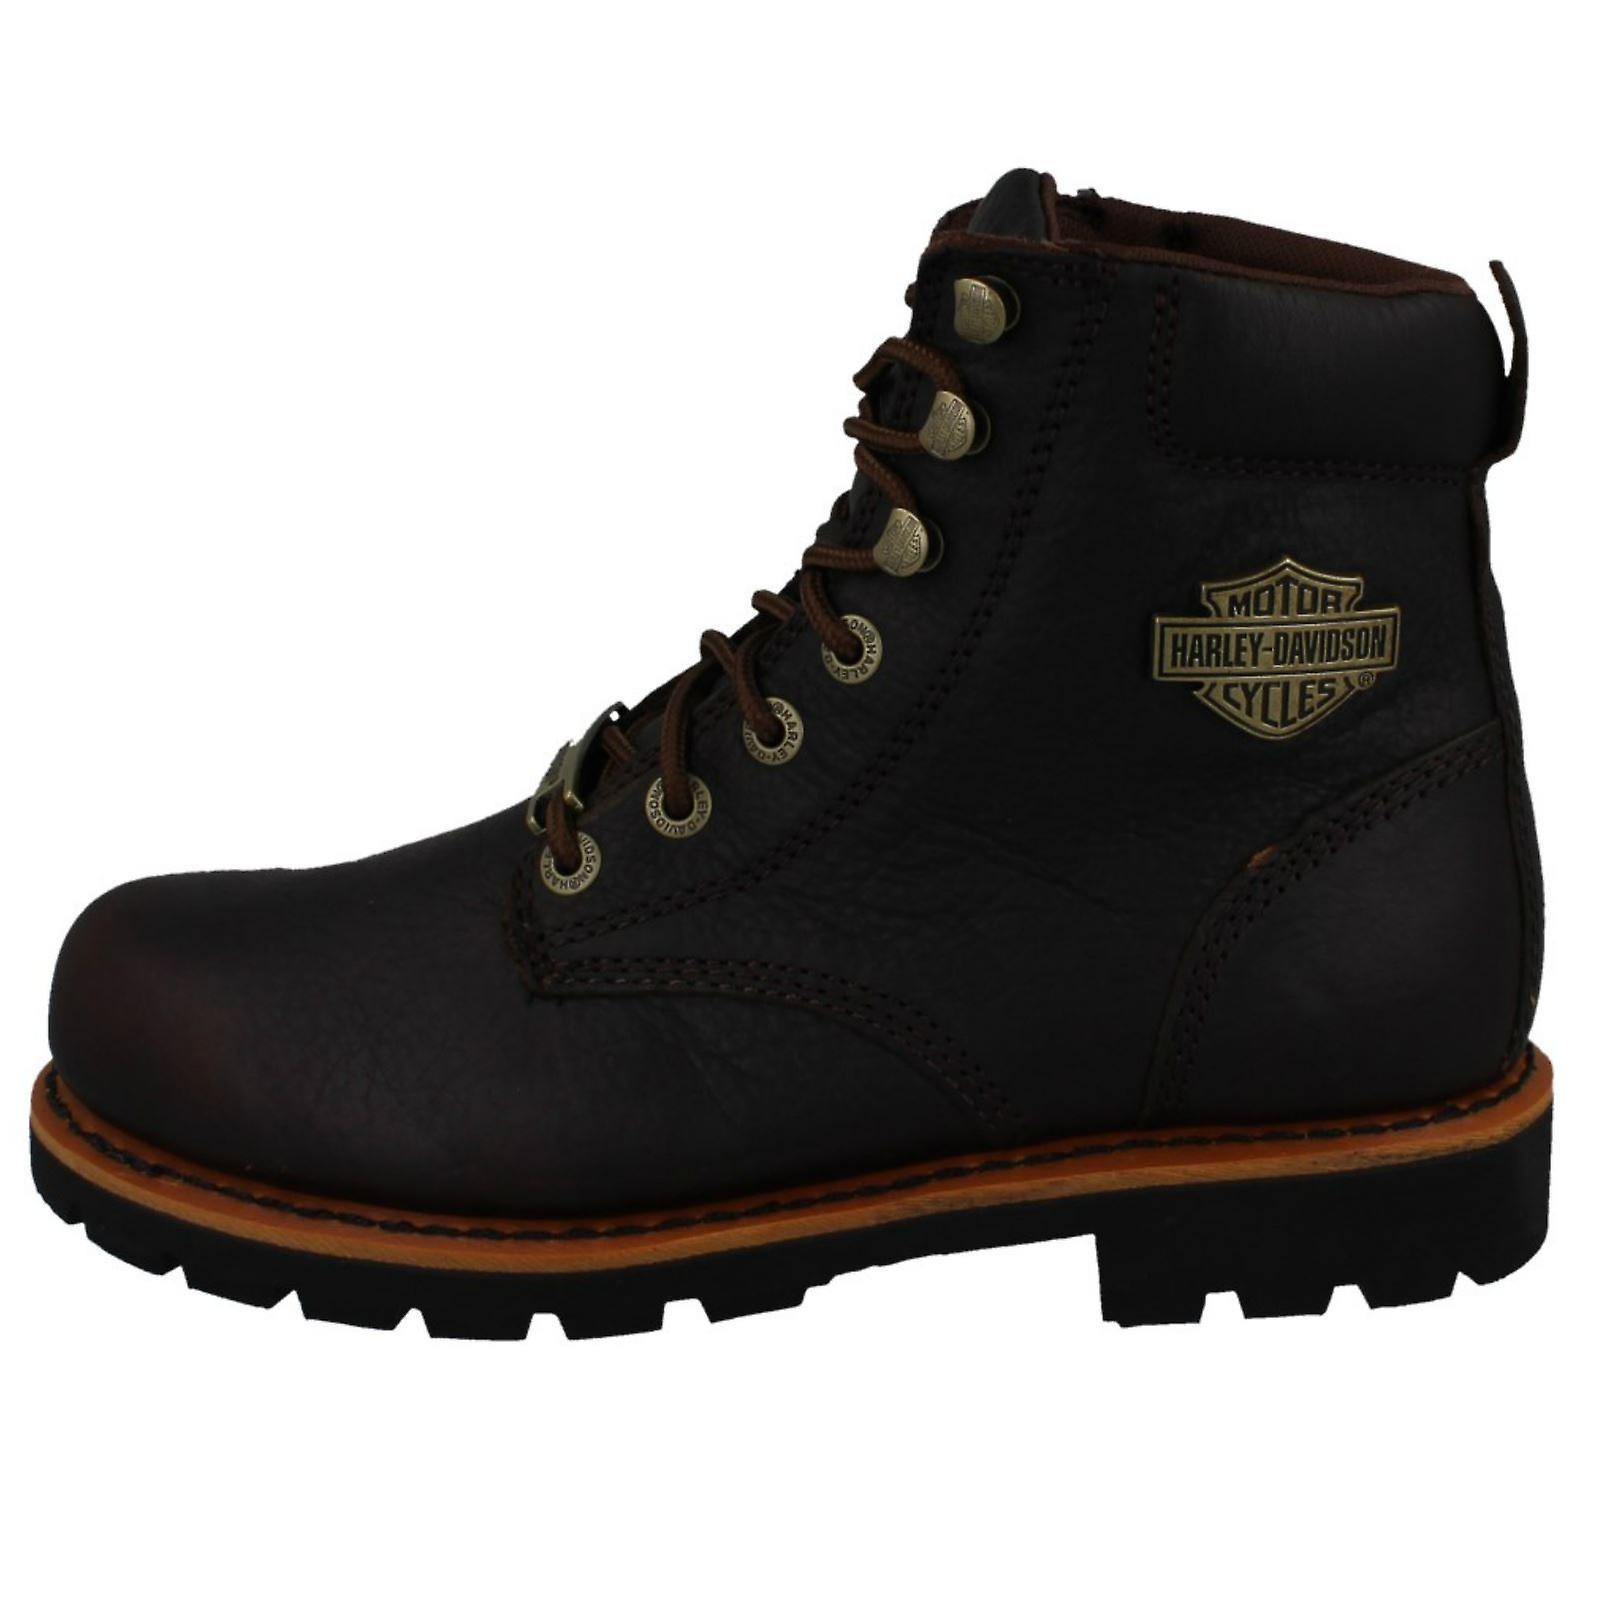 Mens Harley Davidson Ankle Boots Vista Ridge D93424